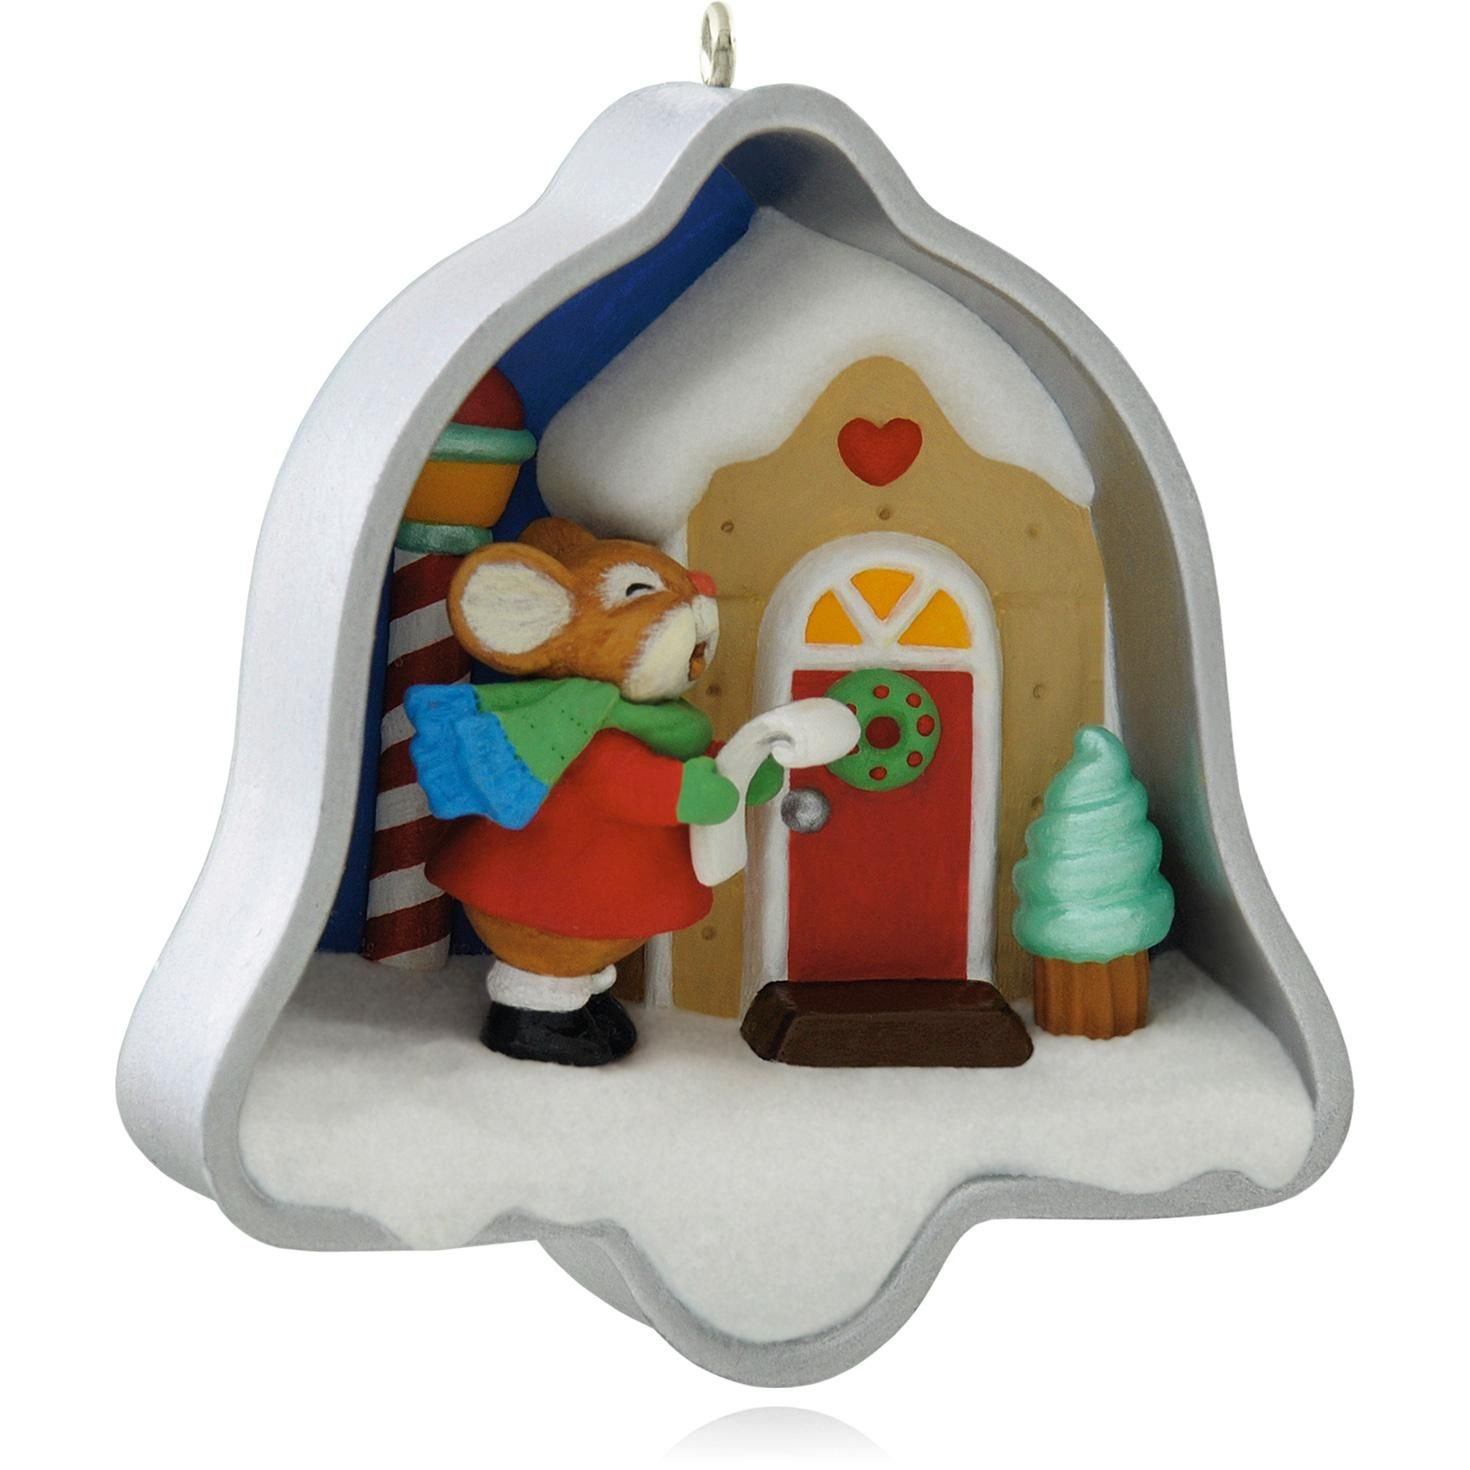 Amazon: 1 X Cookie Cutter Christmas 3rd In Series  2014 Hallmark  Keepsake Ornament: Home & Kitchen